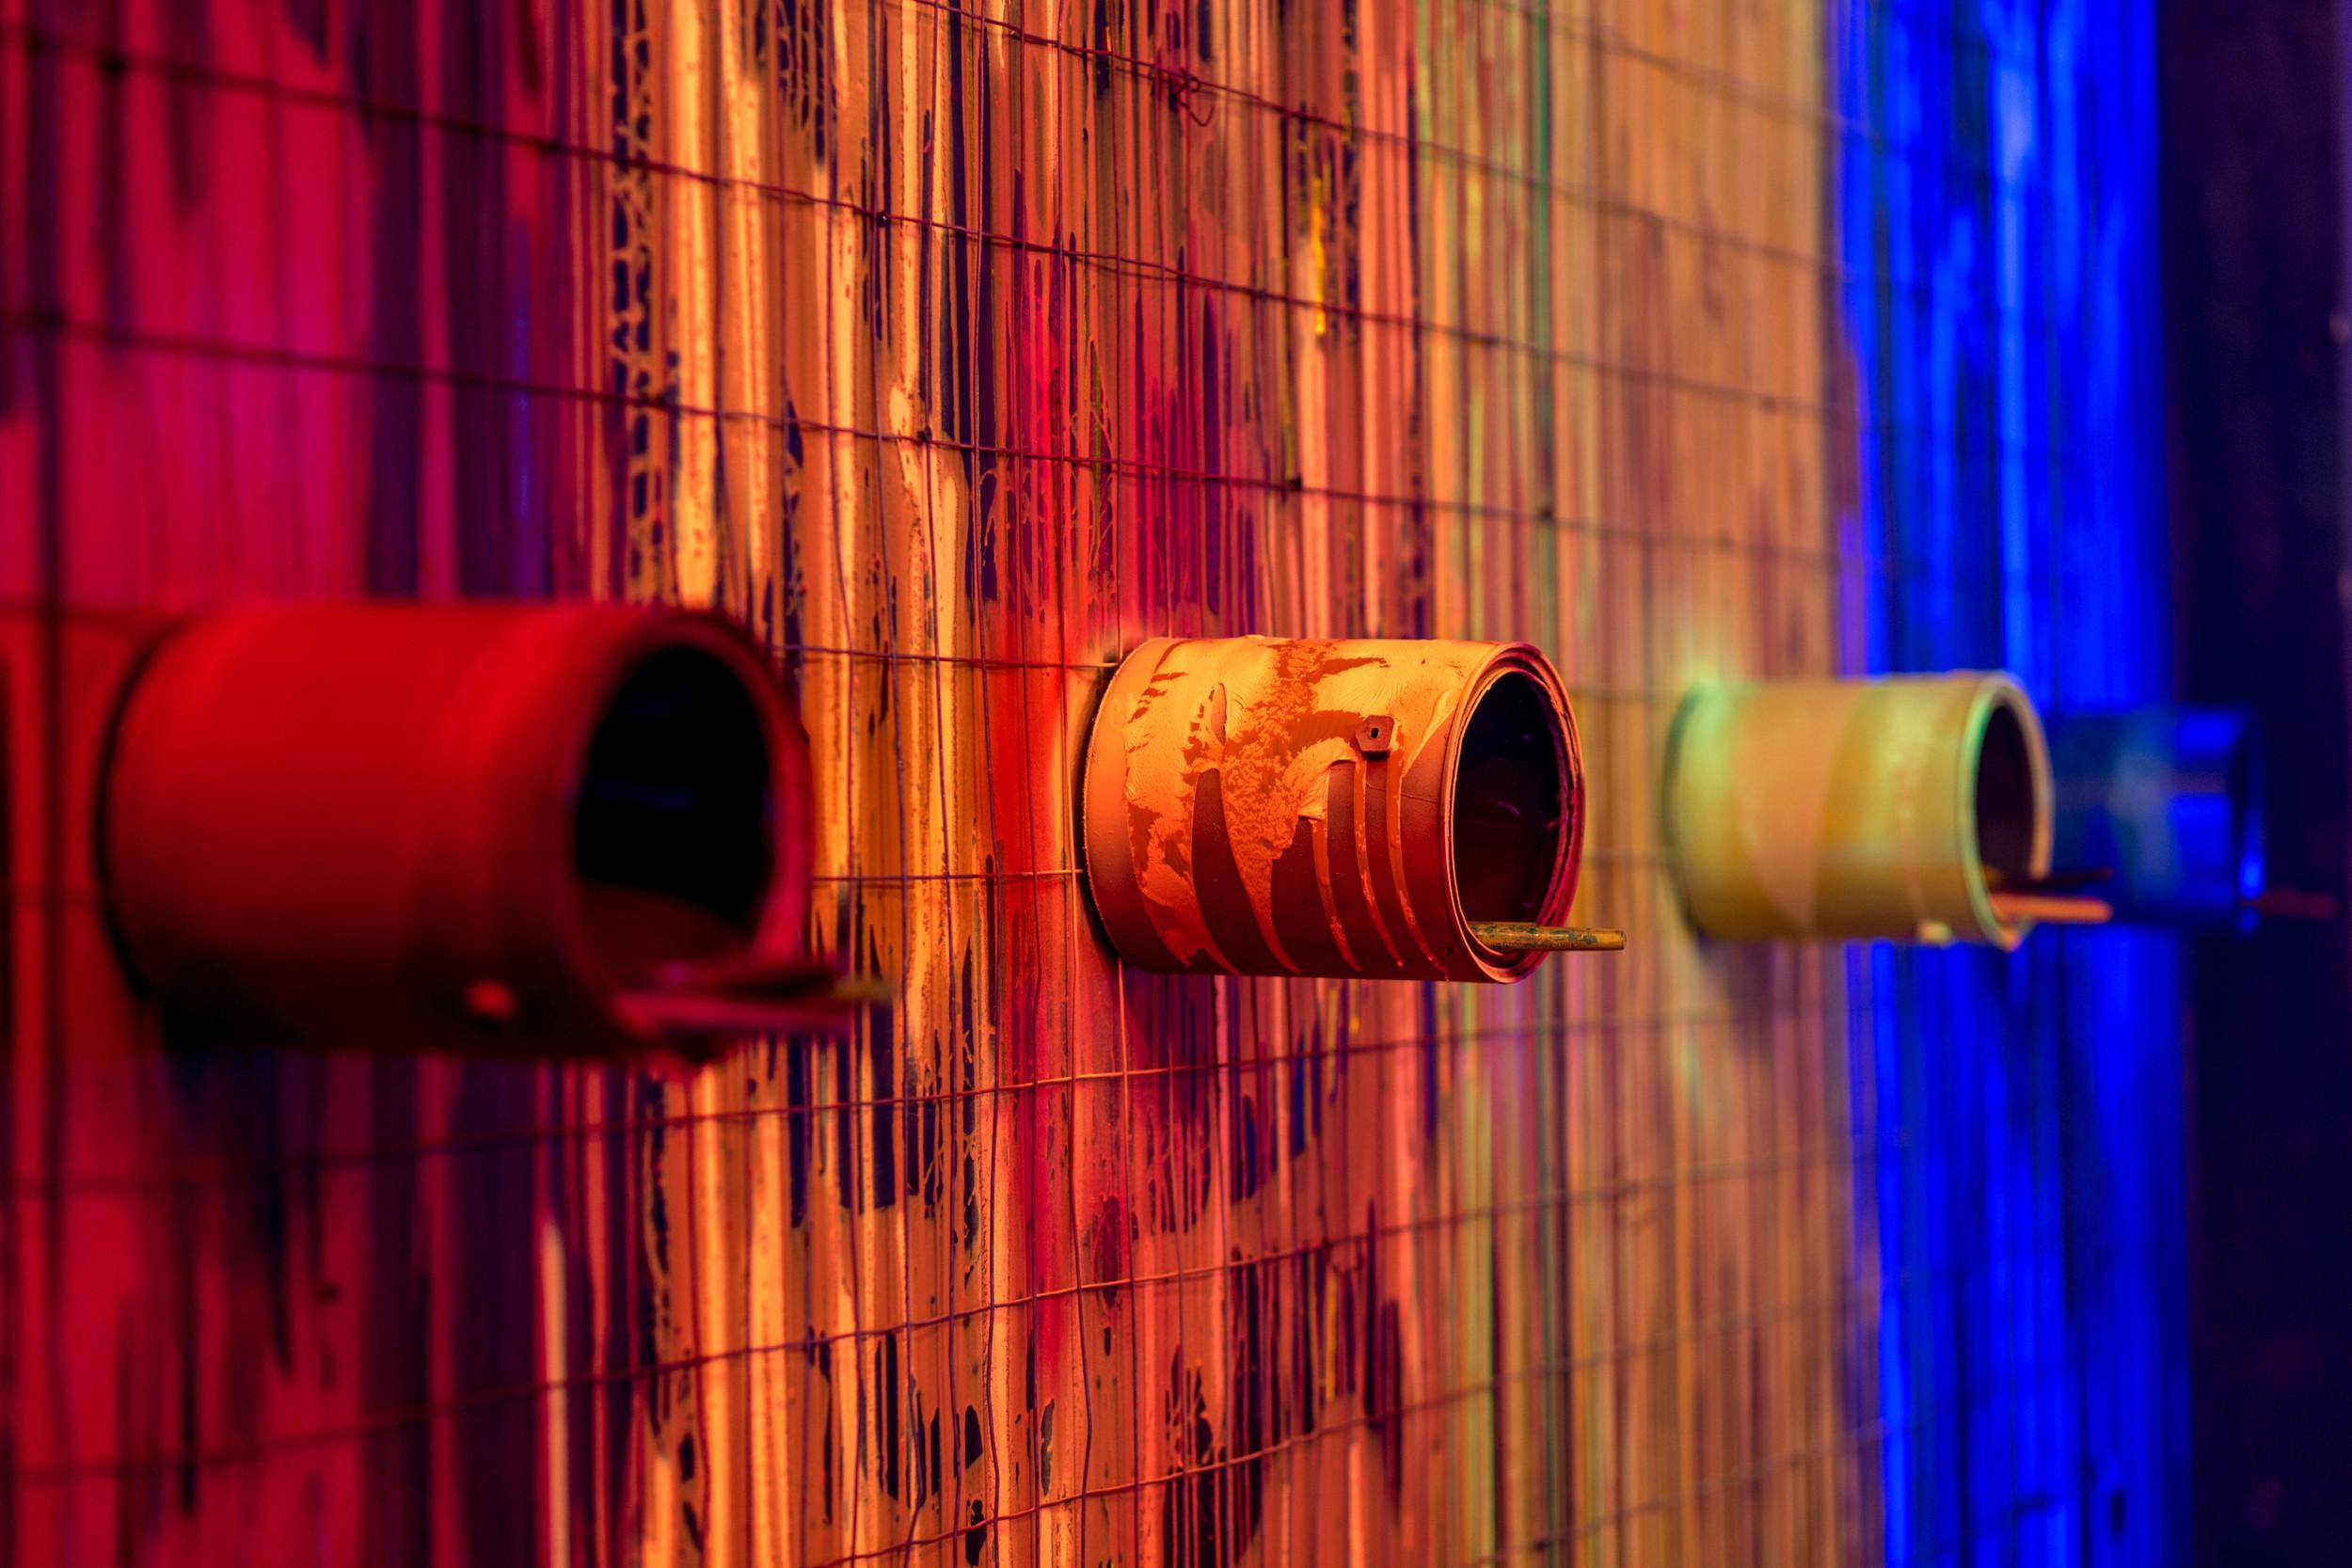 drip_venue_by_ephcto-1.jpg